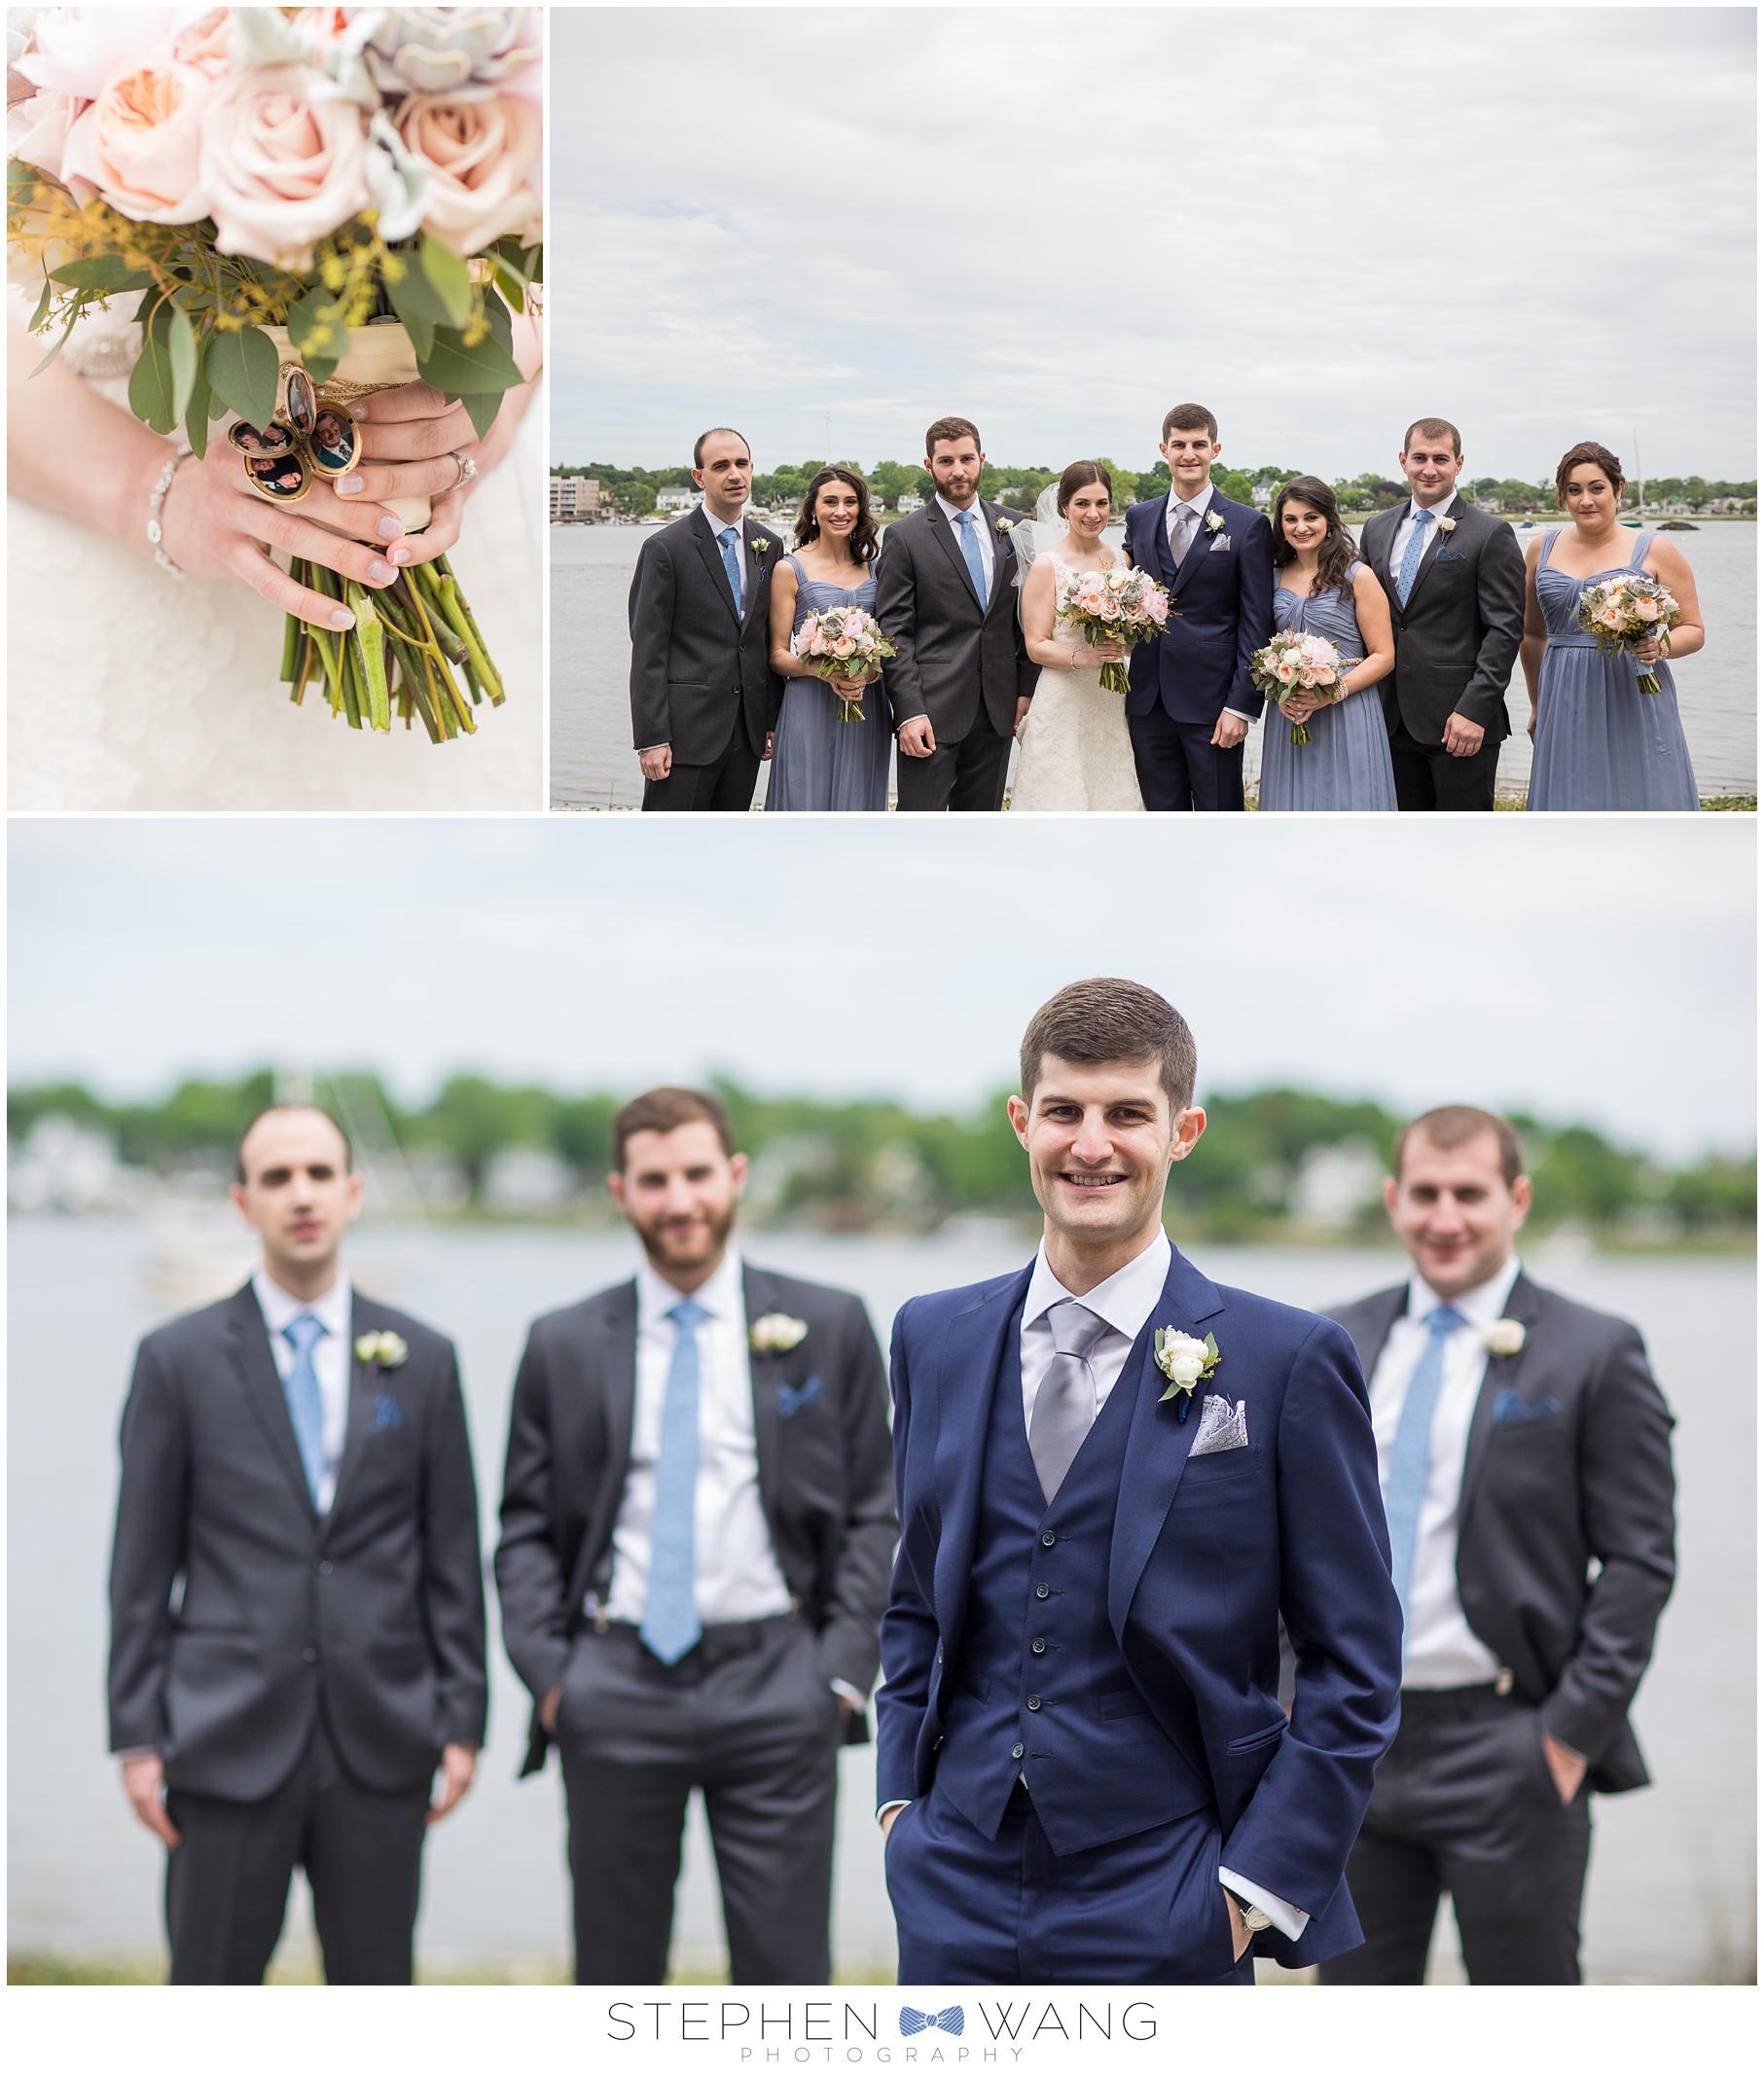 Stephen Wang Photography Shorehaven Norwalk CT Wedding Photographer connecticut shoreline shore haven - 16.jpg